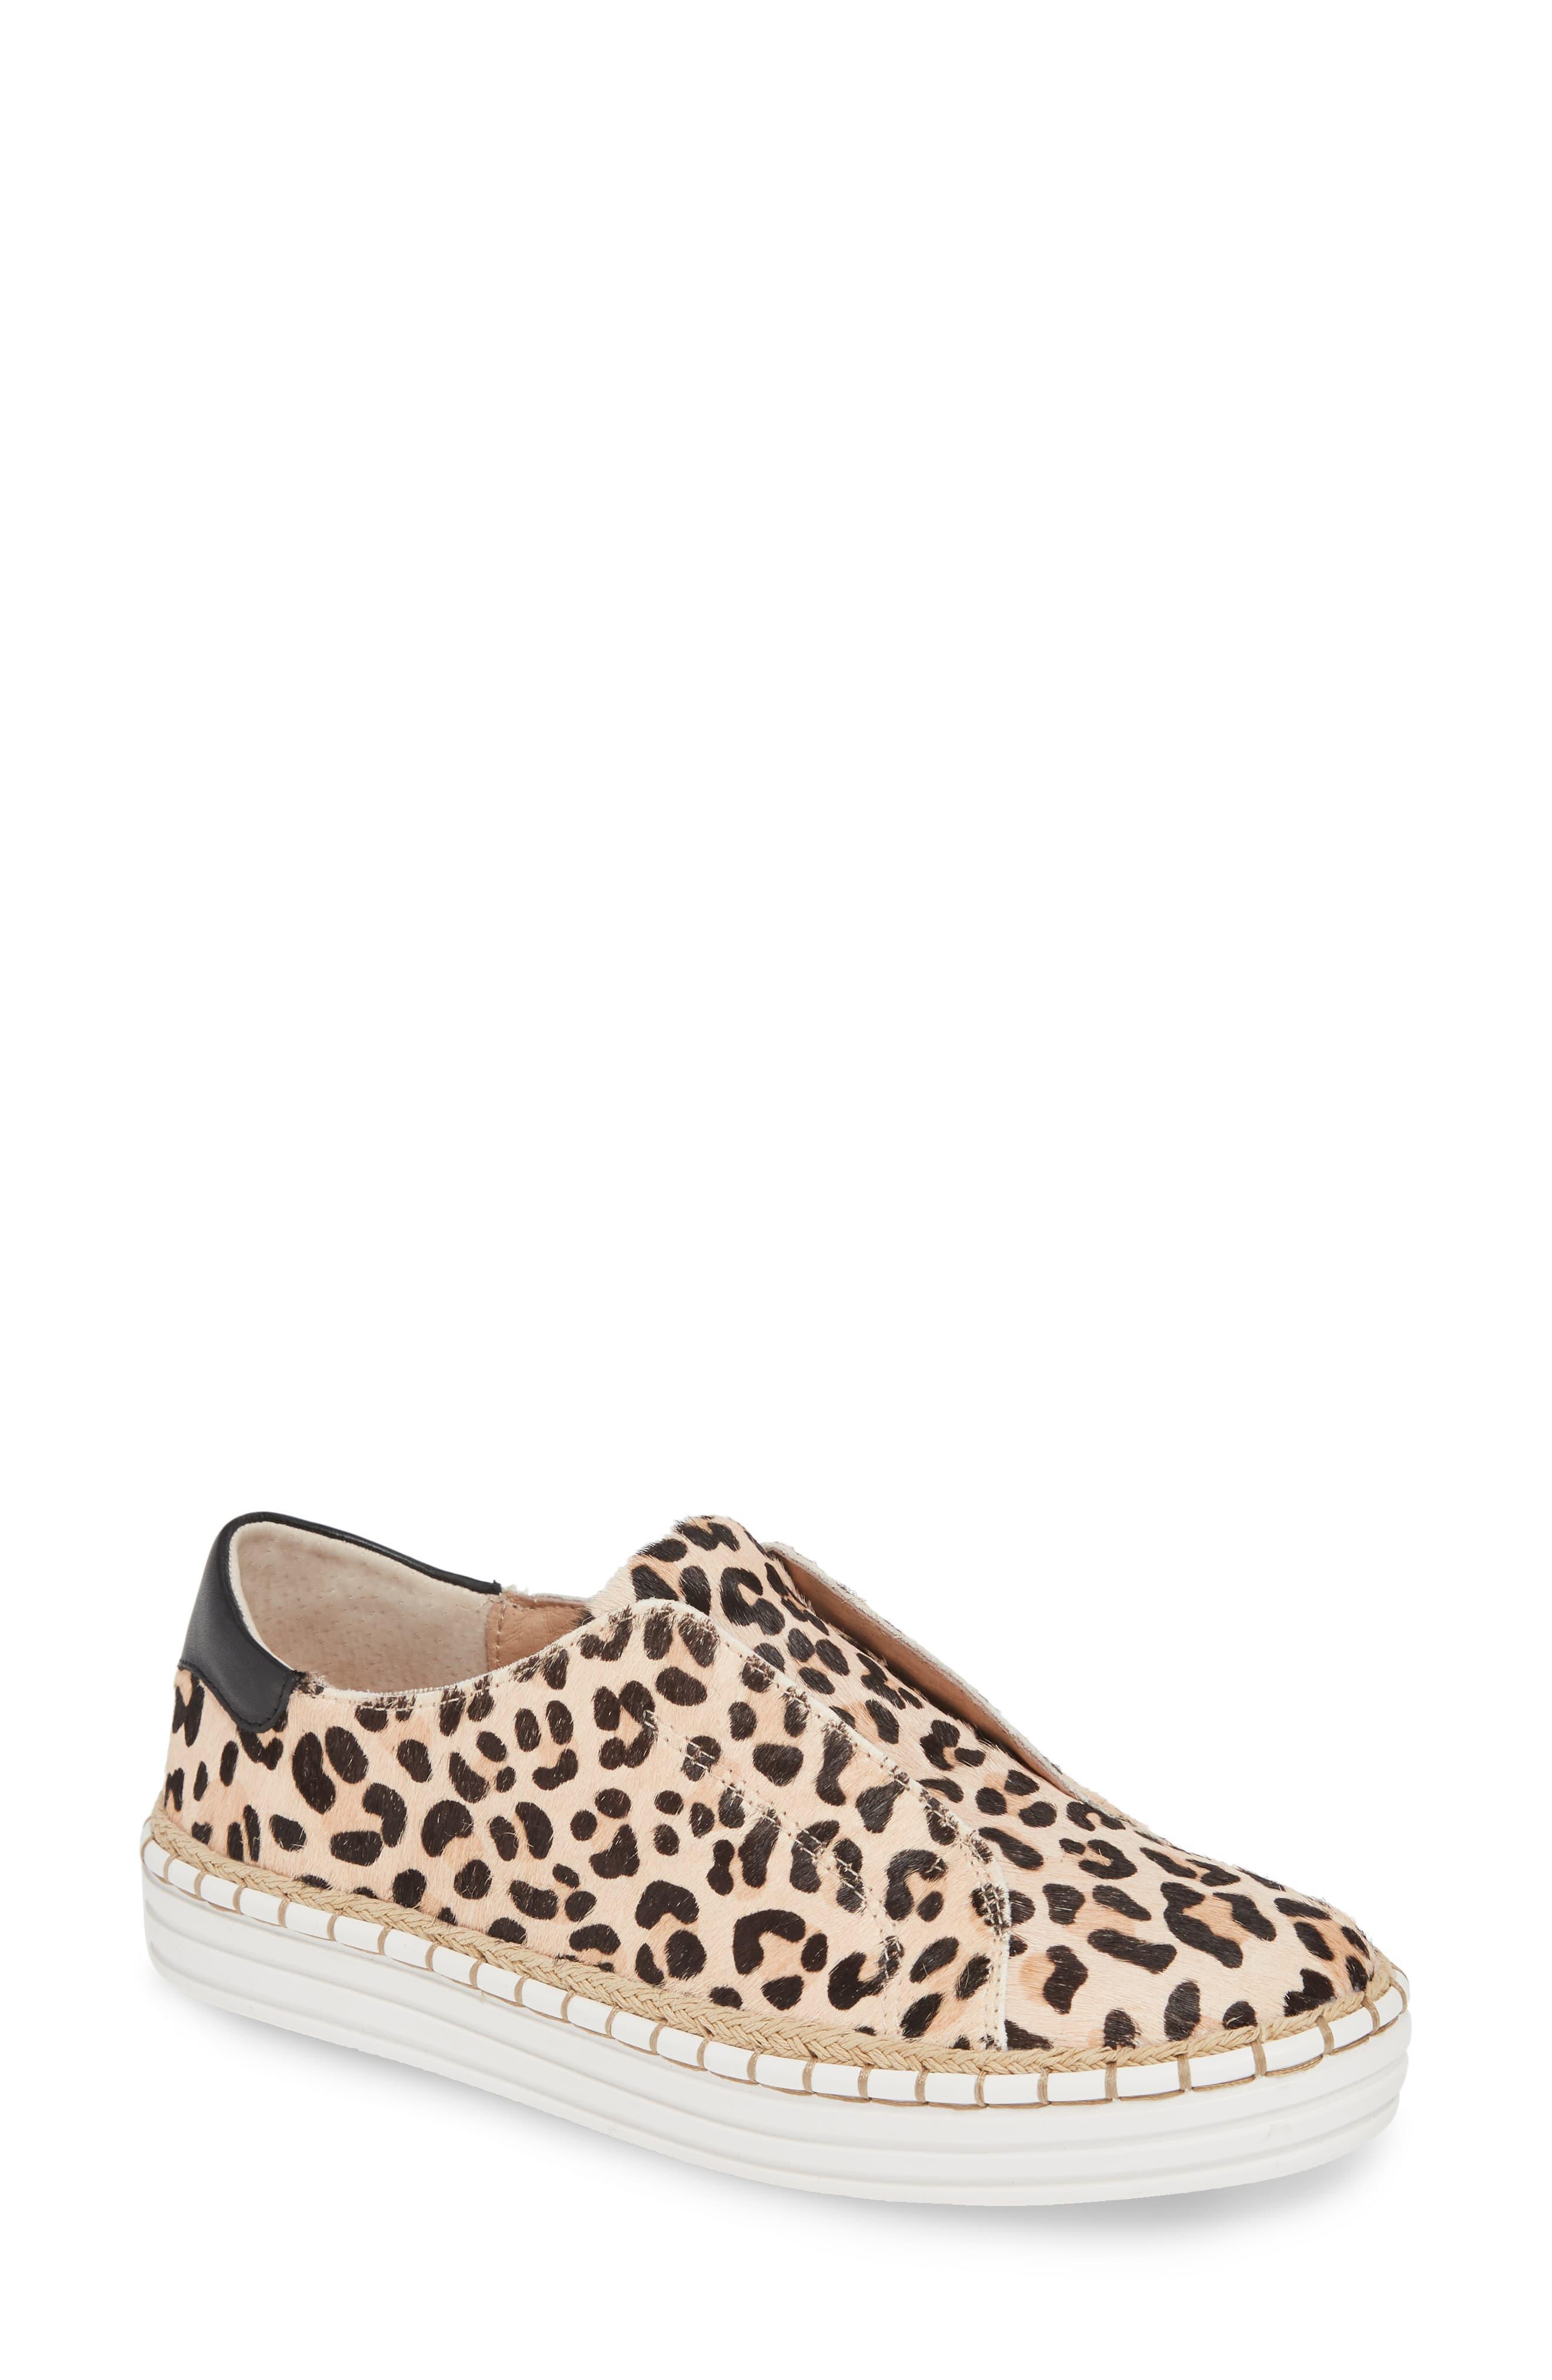 J/Slides Leather Karla Sneaker Leopard